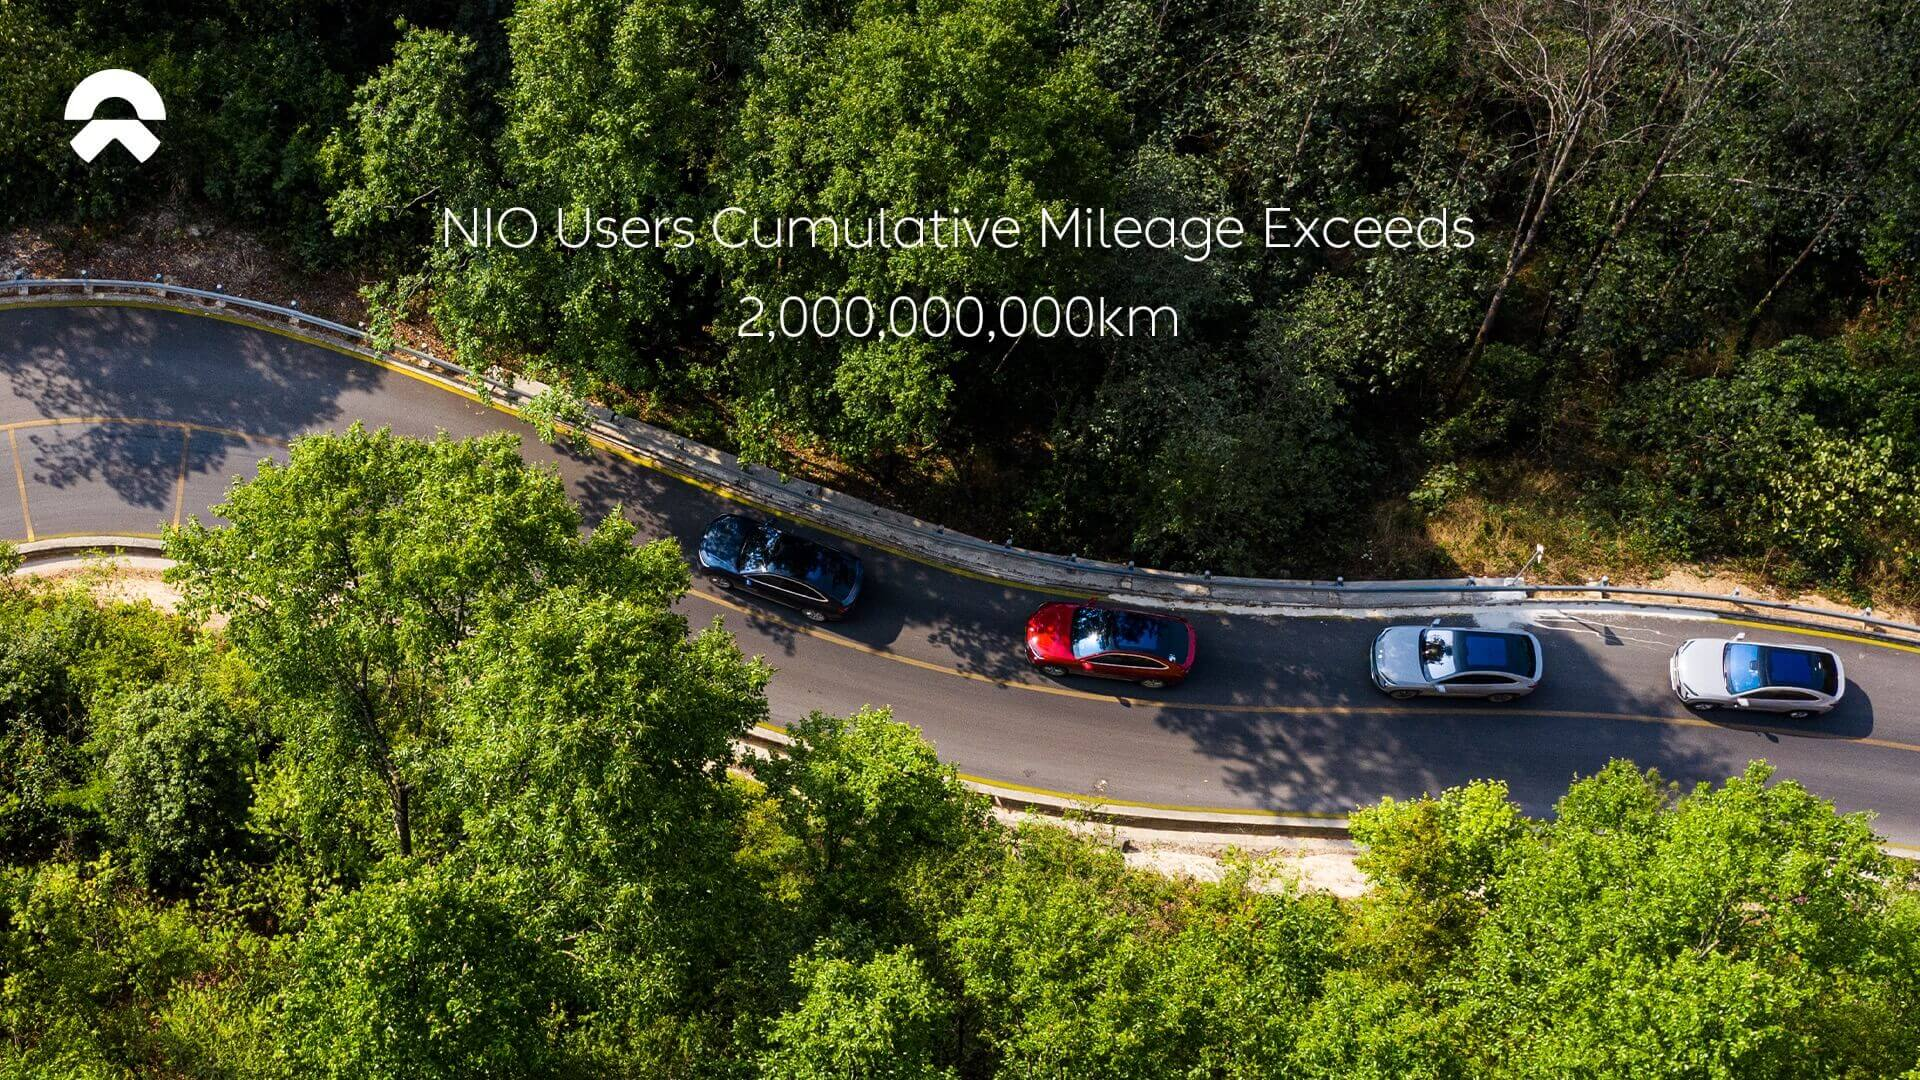 Электромобили NIO проехали 2 млрд км